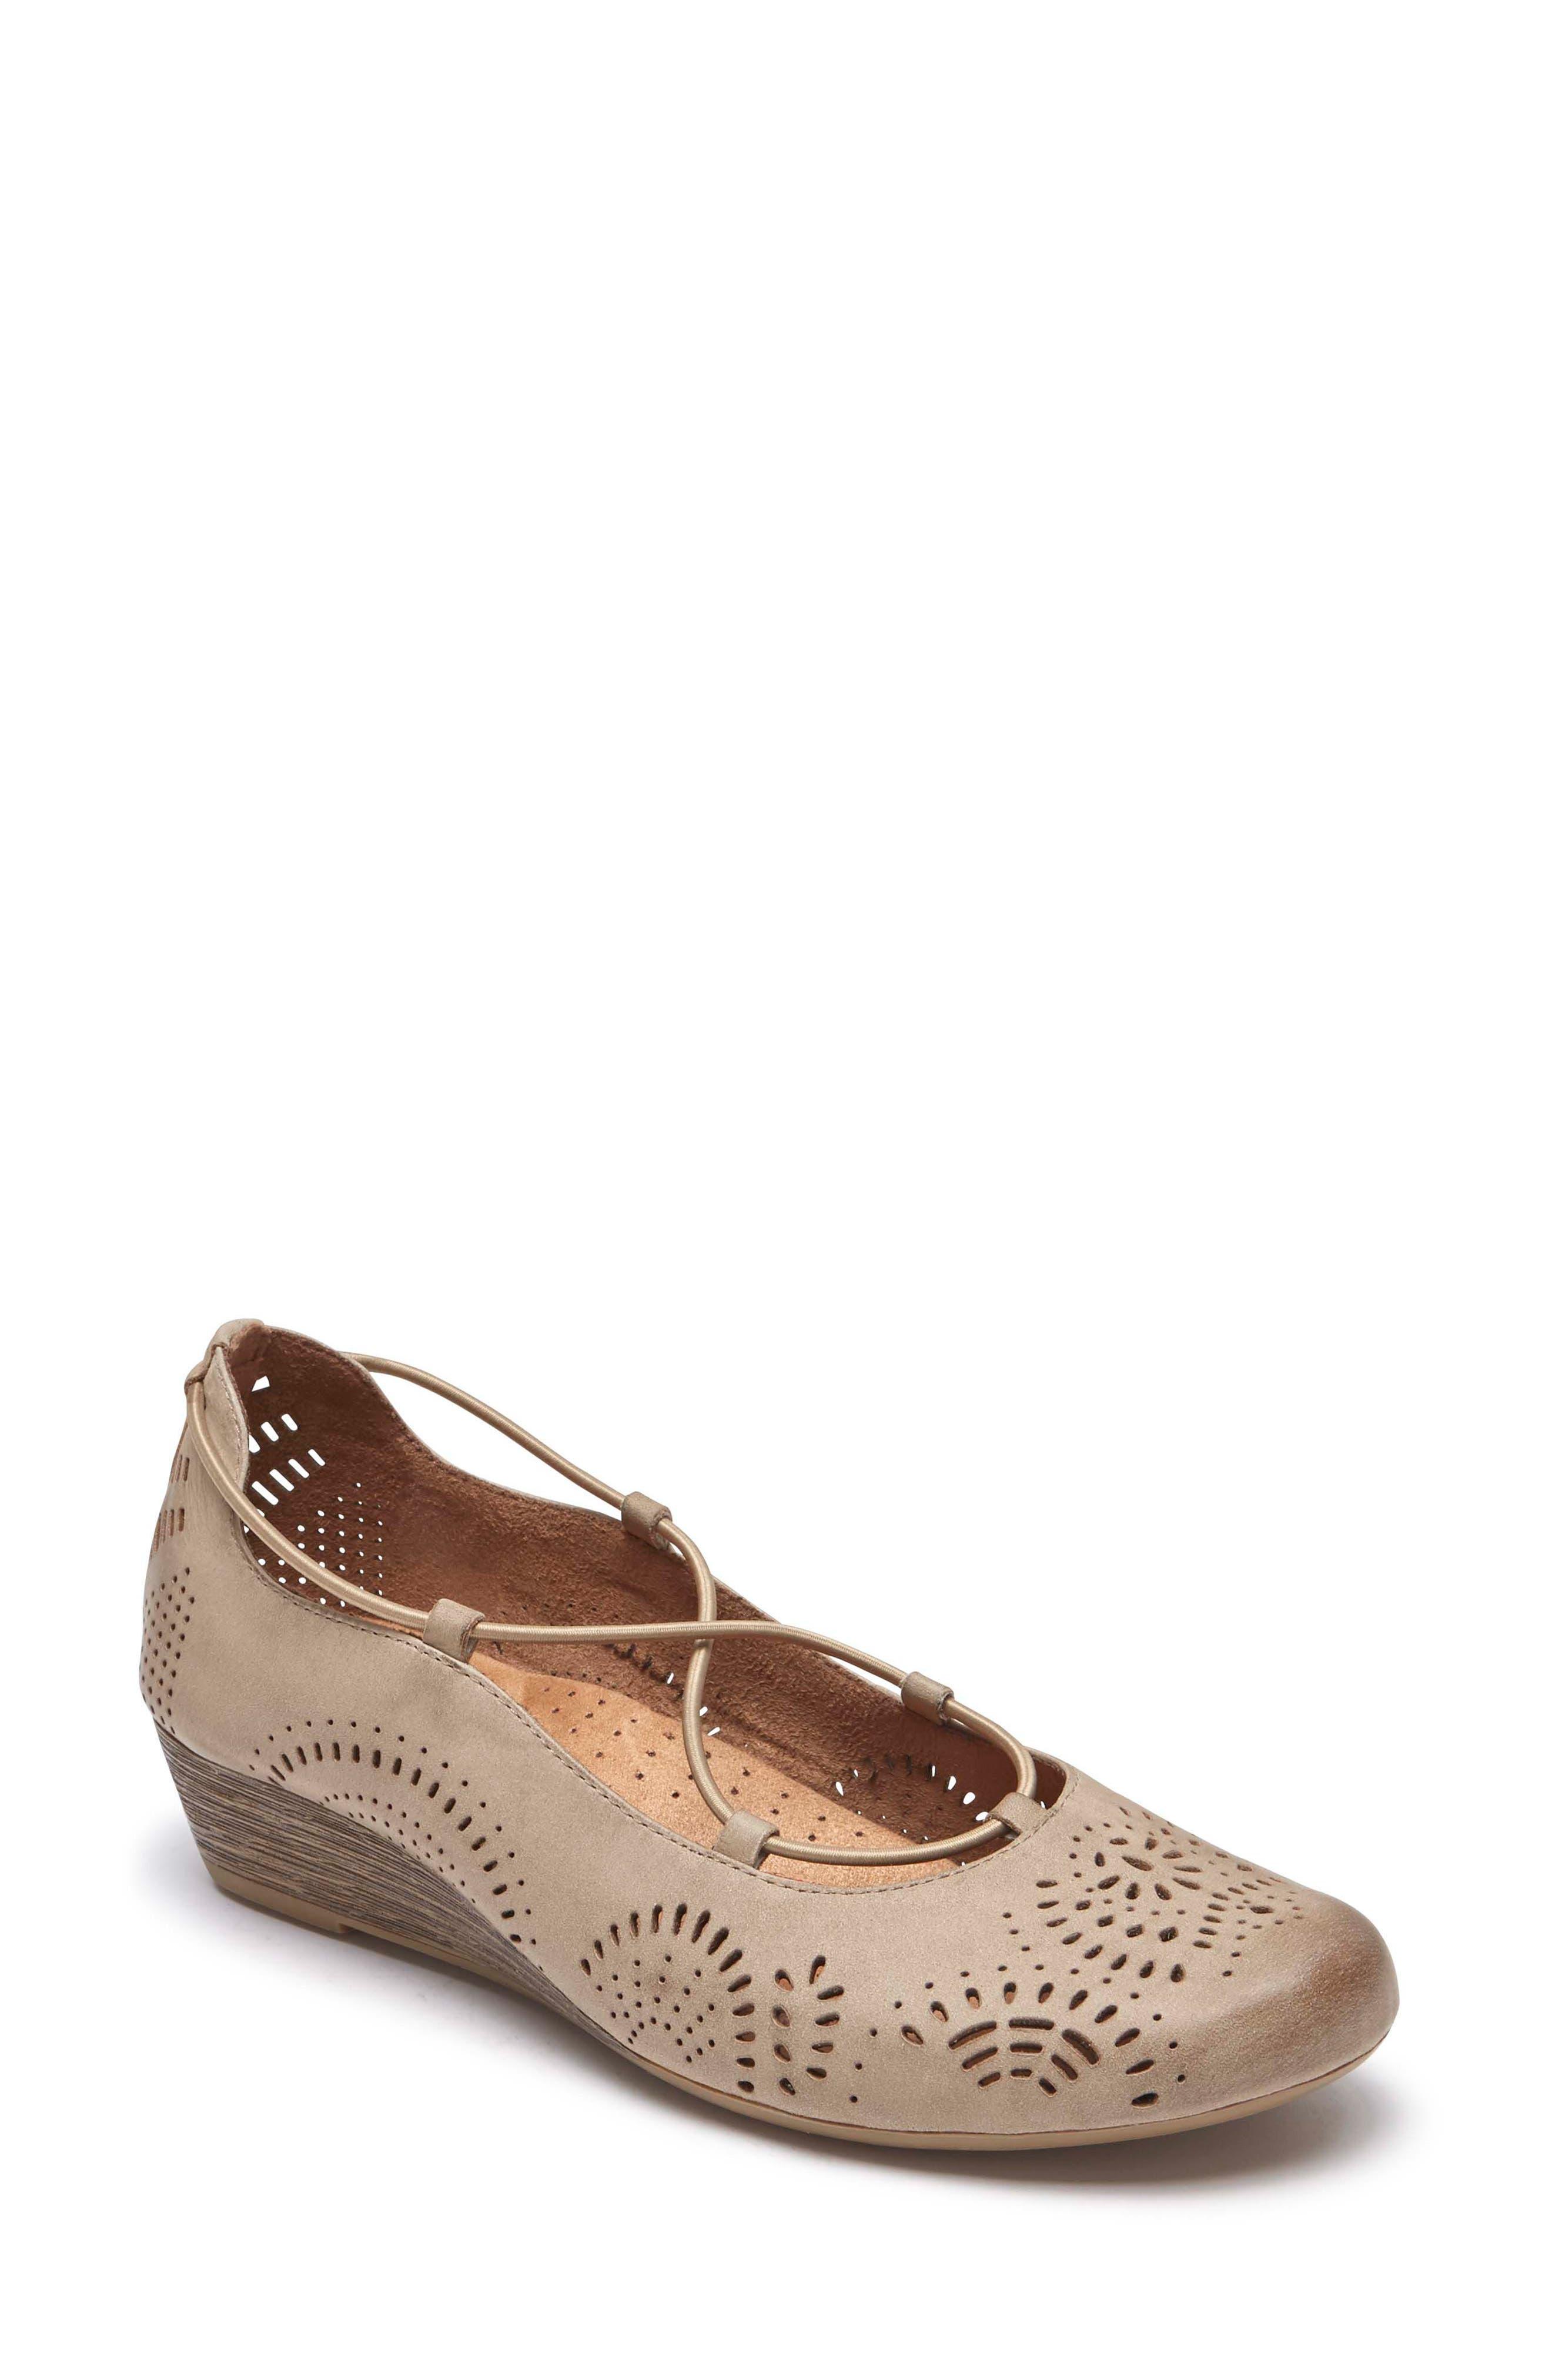 Janna Cross Strap Wedge Sandal,                             Main thumbnail 4, color,